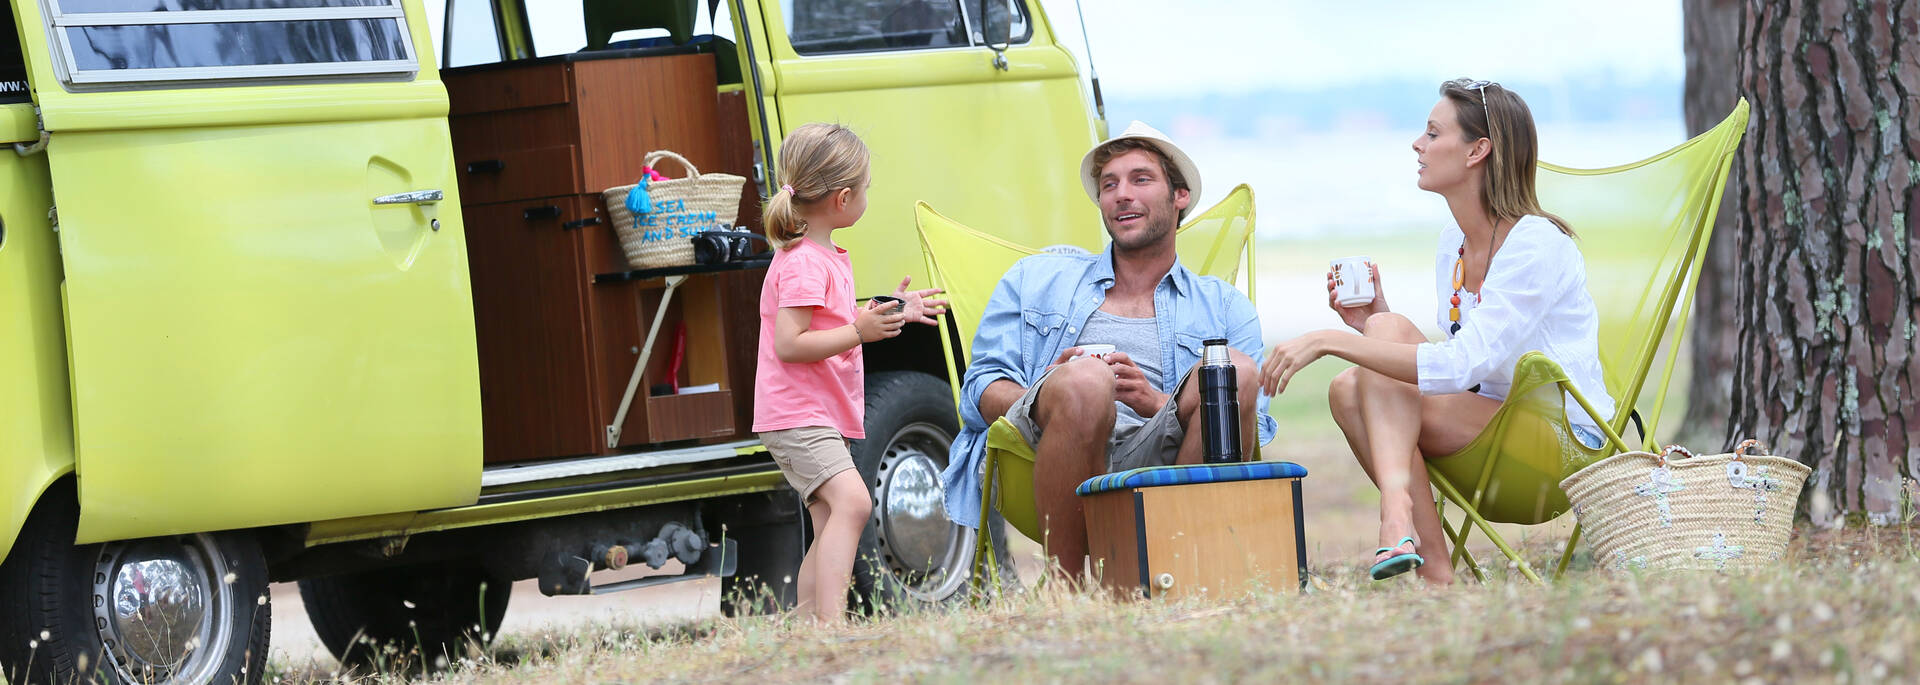 Famille avec van dans un camping - ©Shutterstock